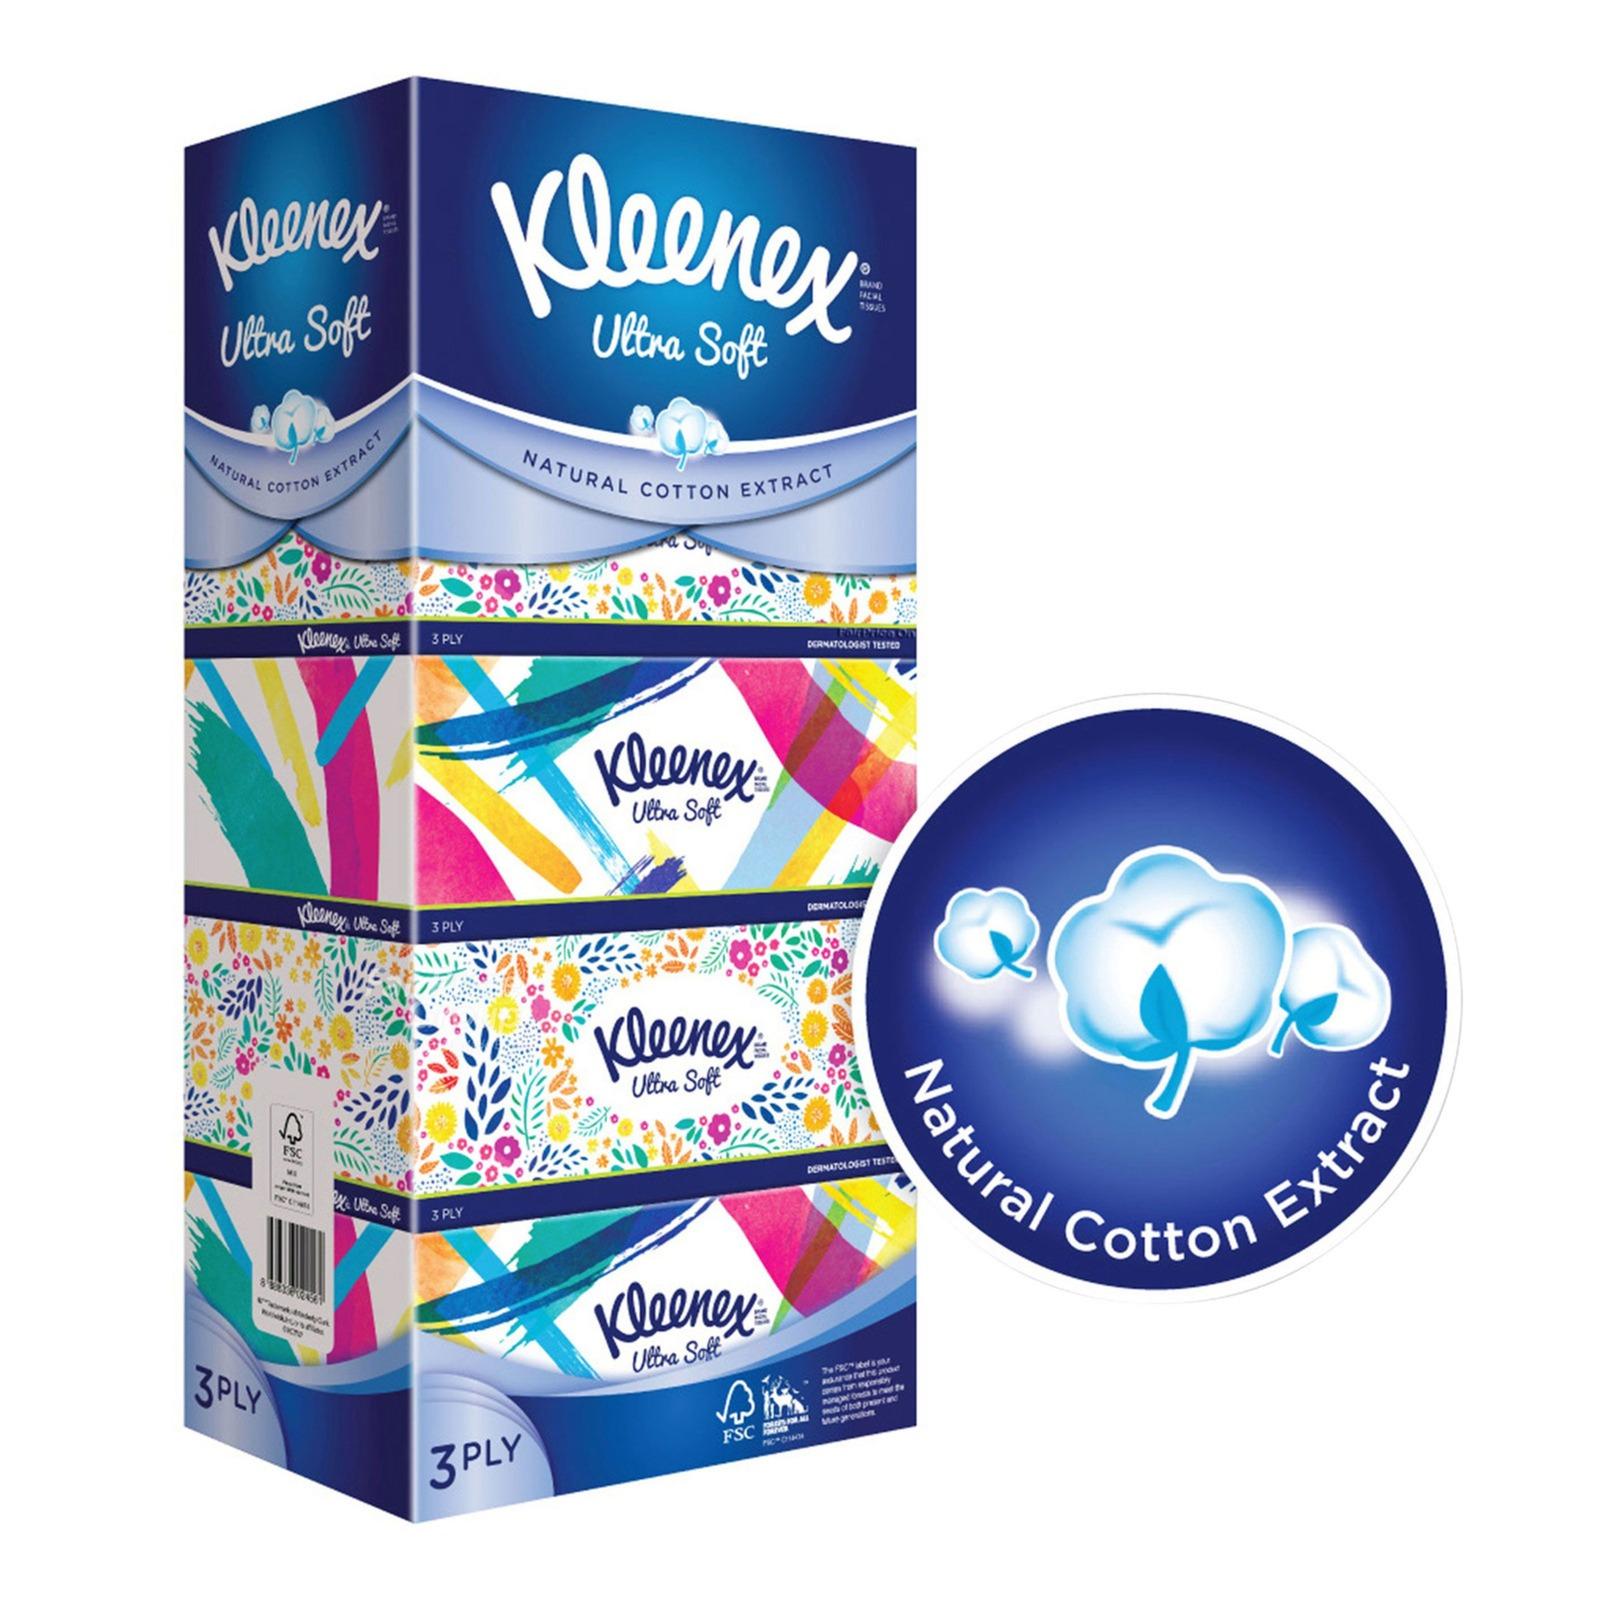 Kleenex Facial Tissue Box - Floral (3ply)